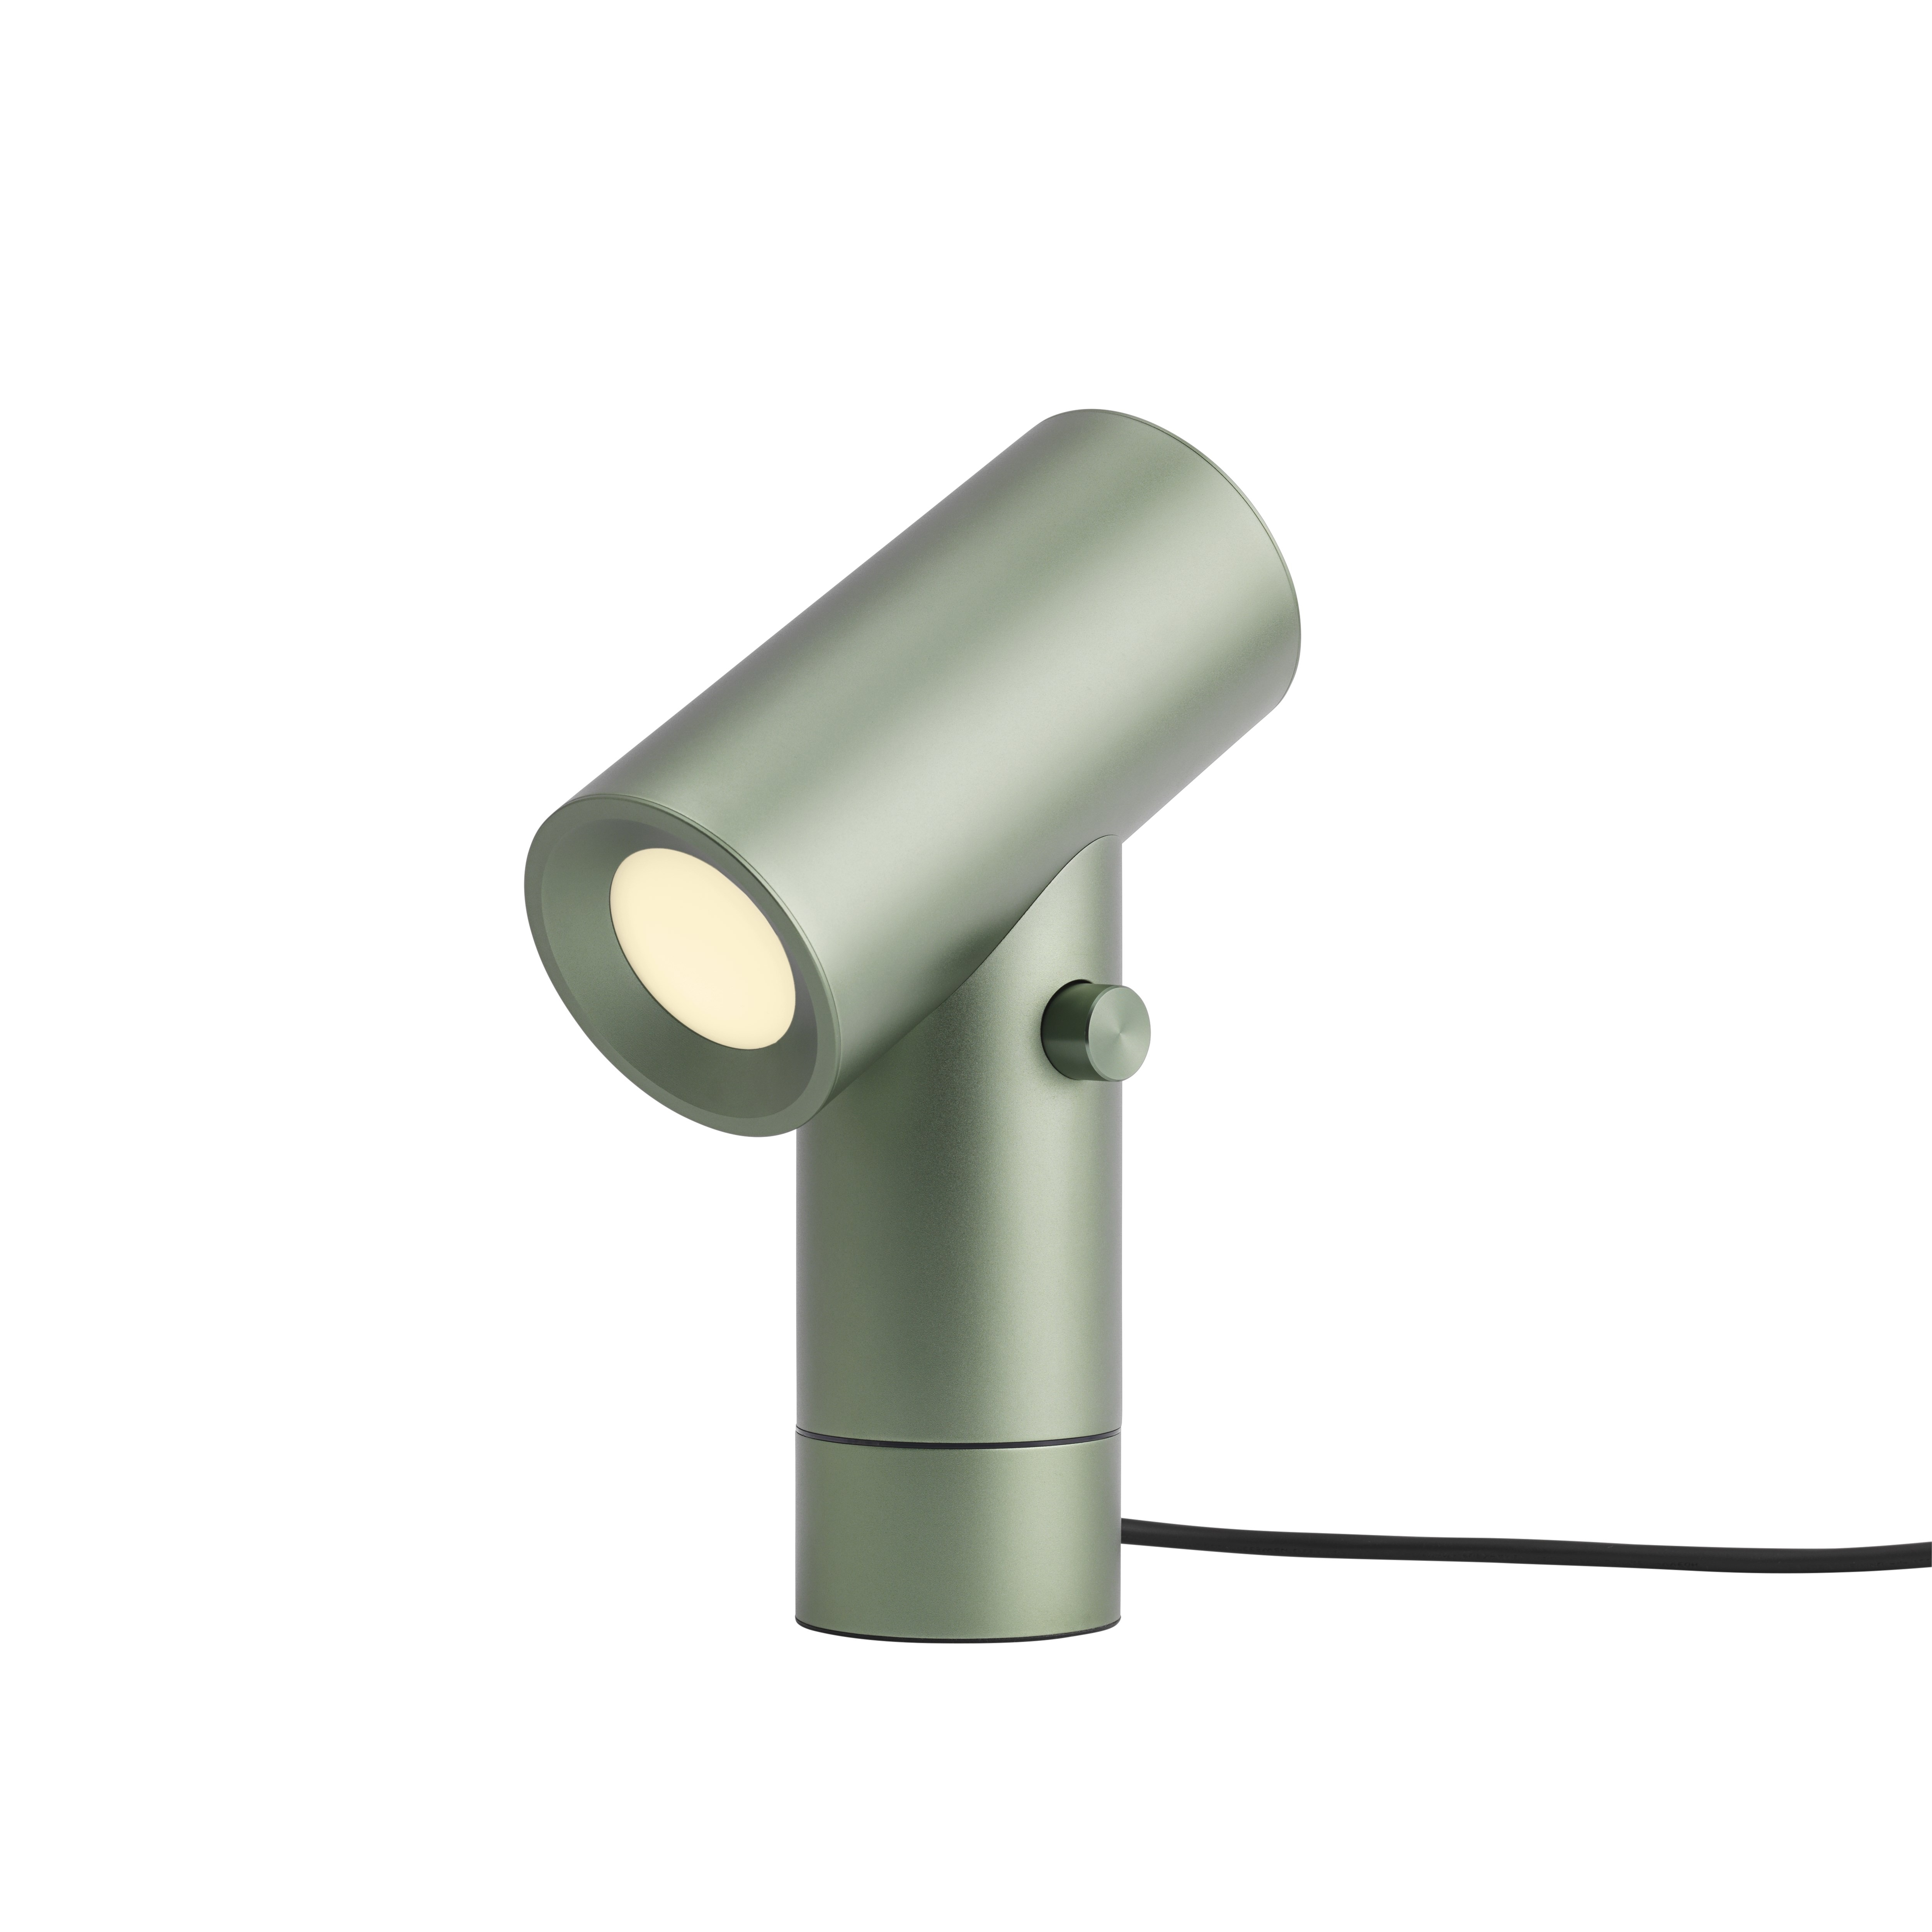 Beam bordslampa grön